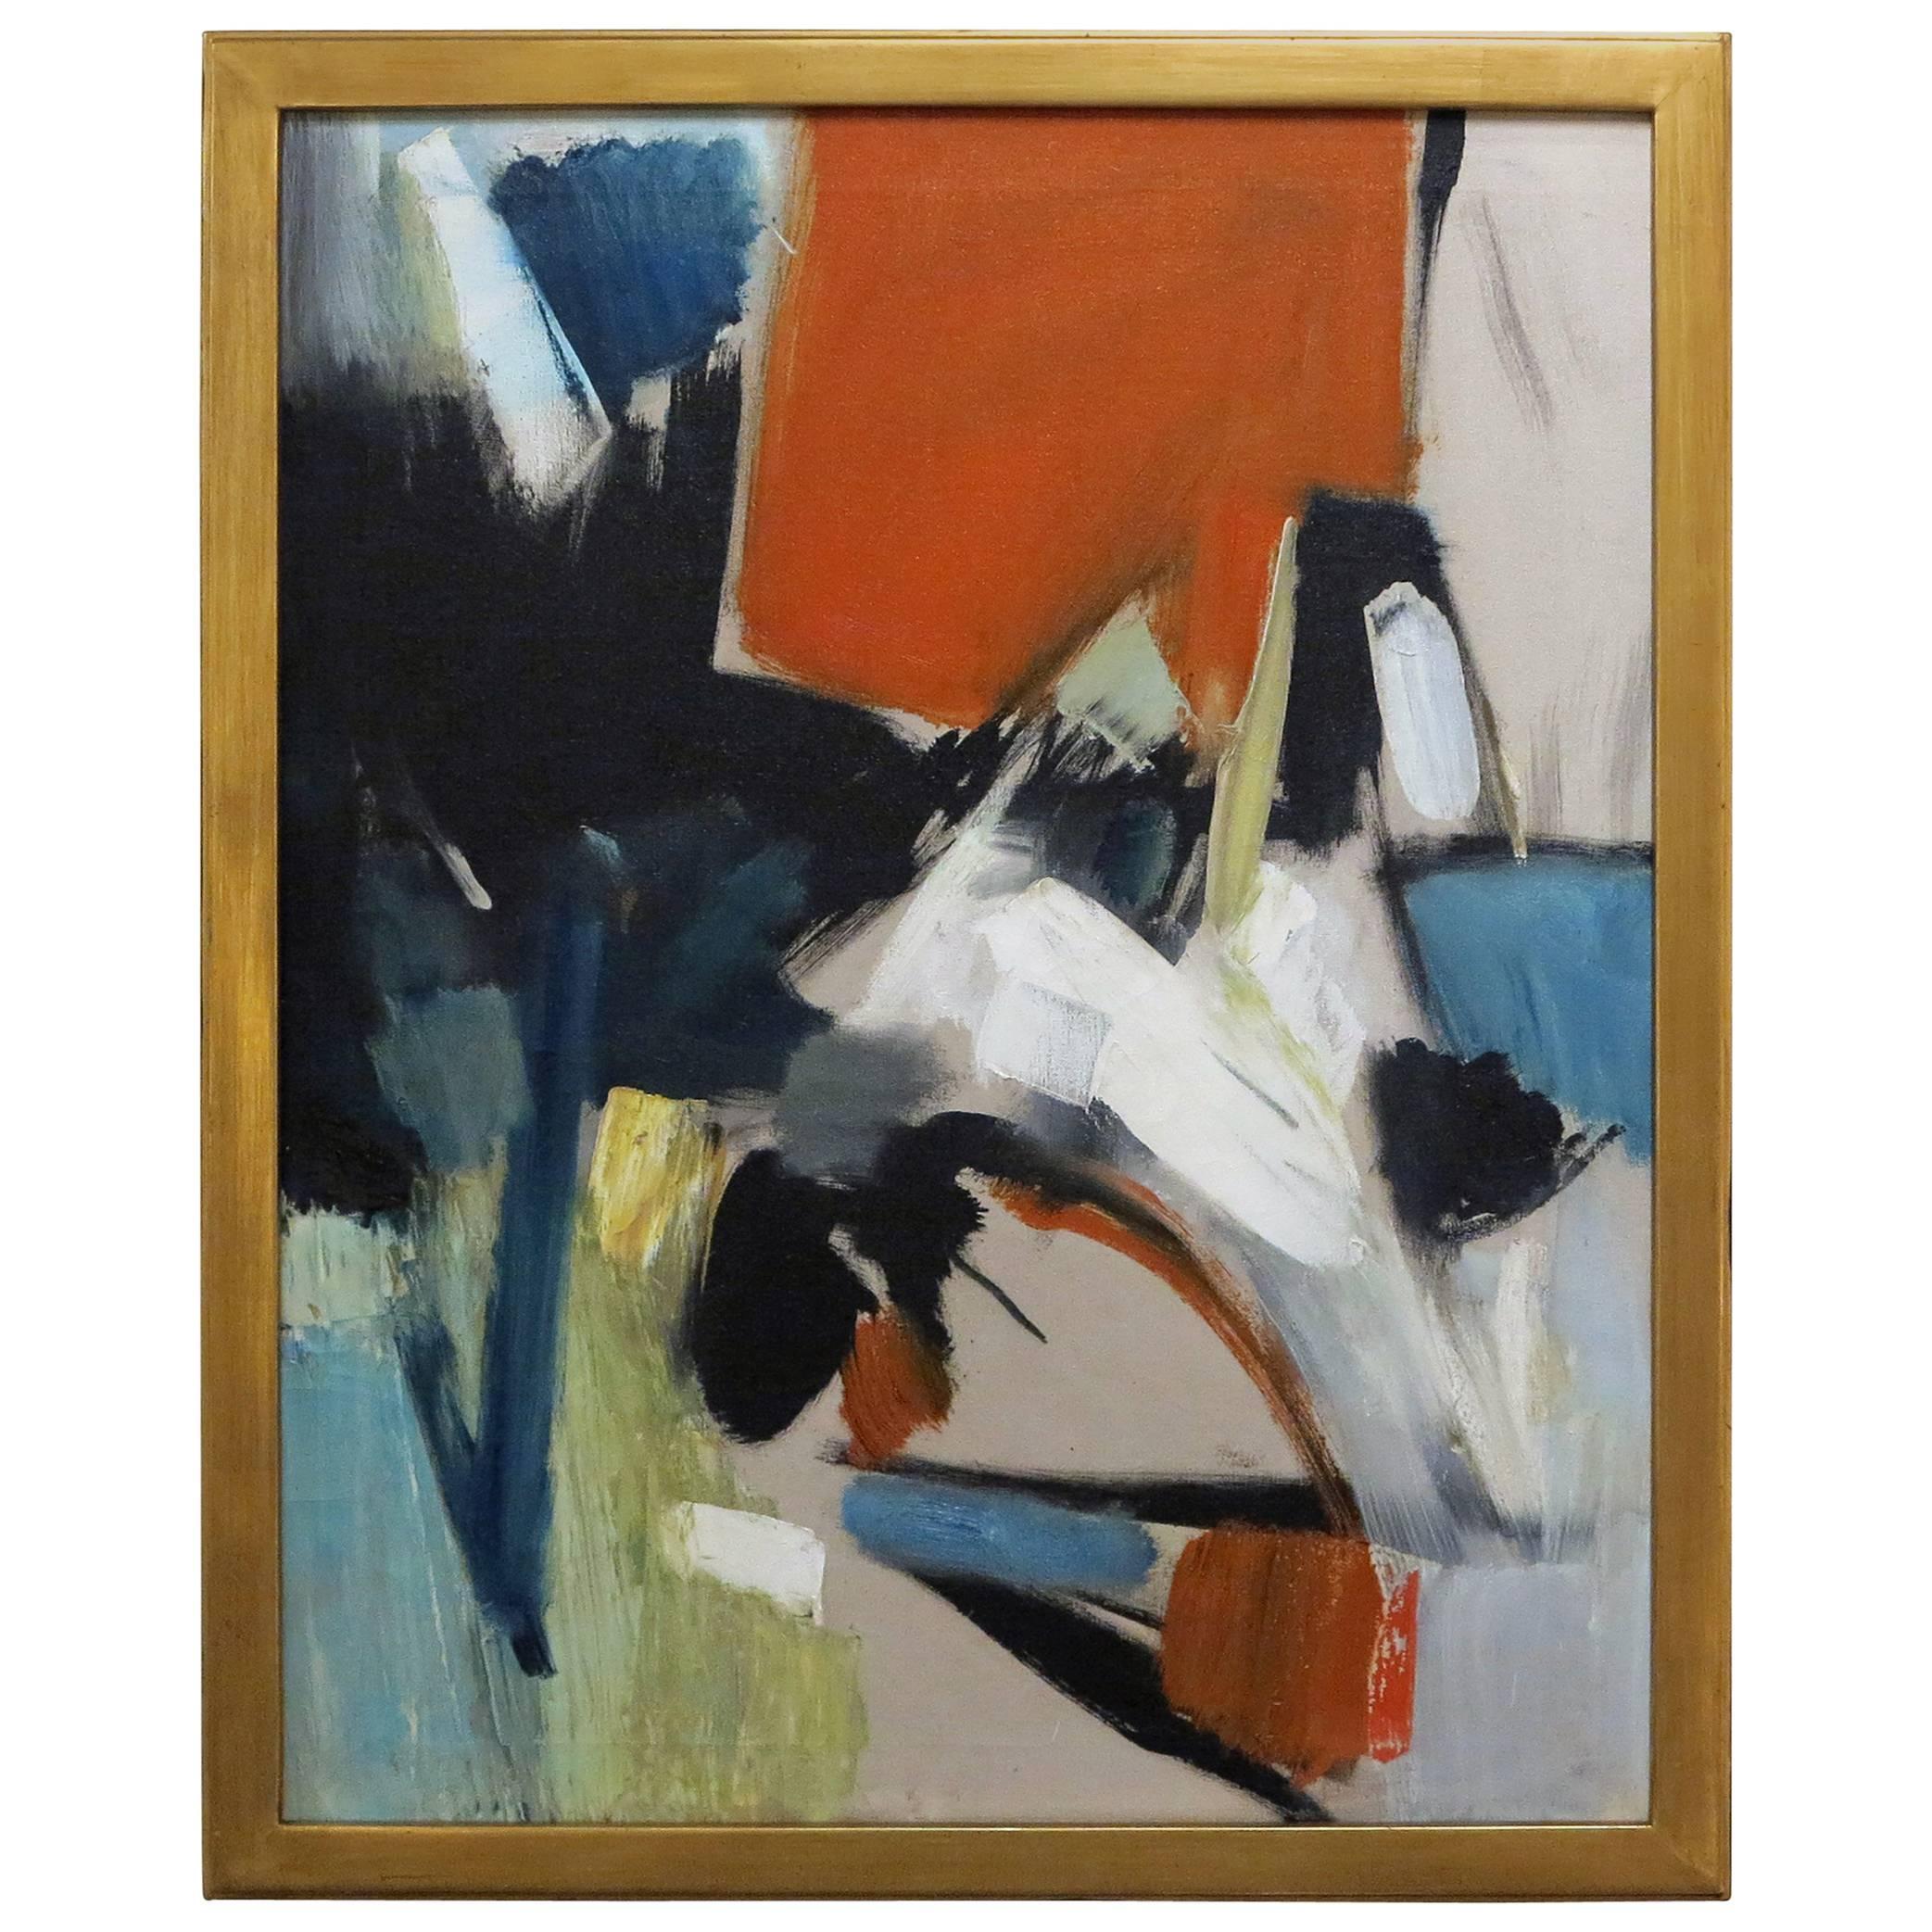 Abstract by Donald Raymond David